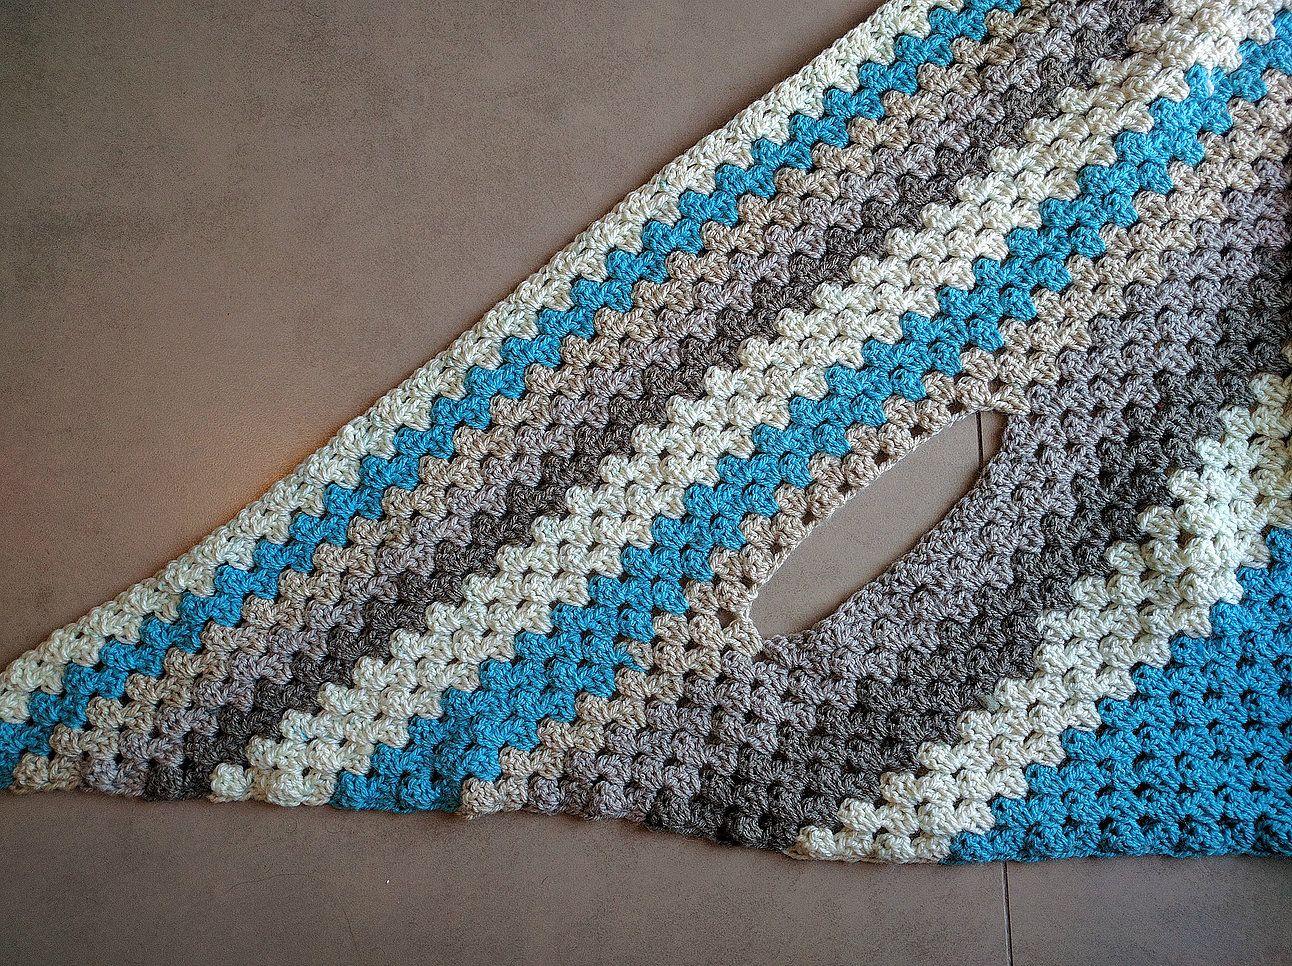 Caron cake triangle shawlscarf the versatile vest